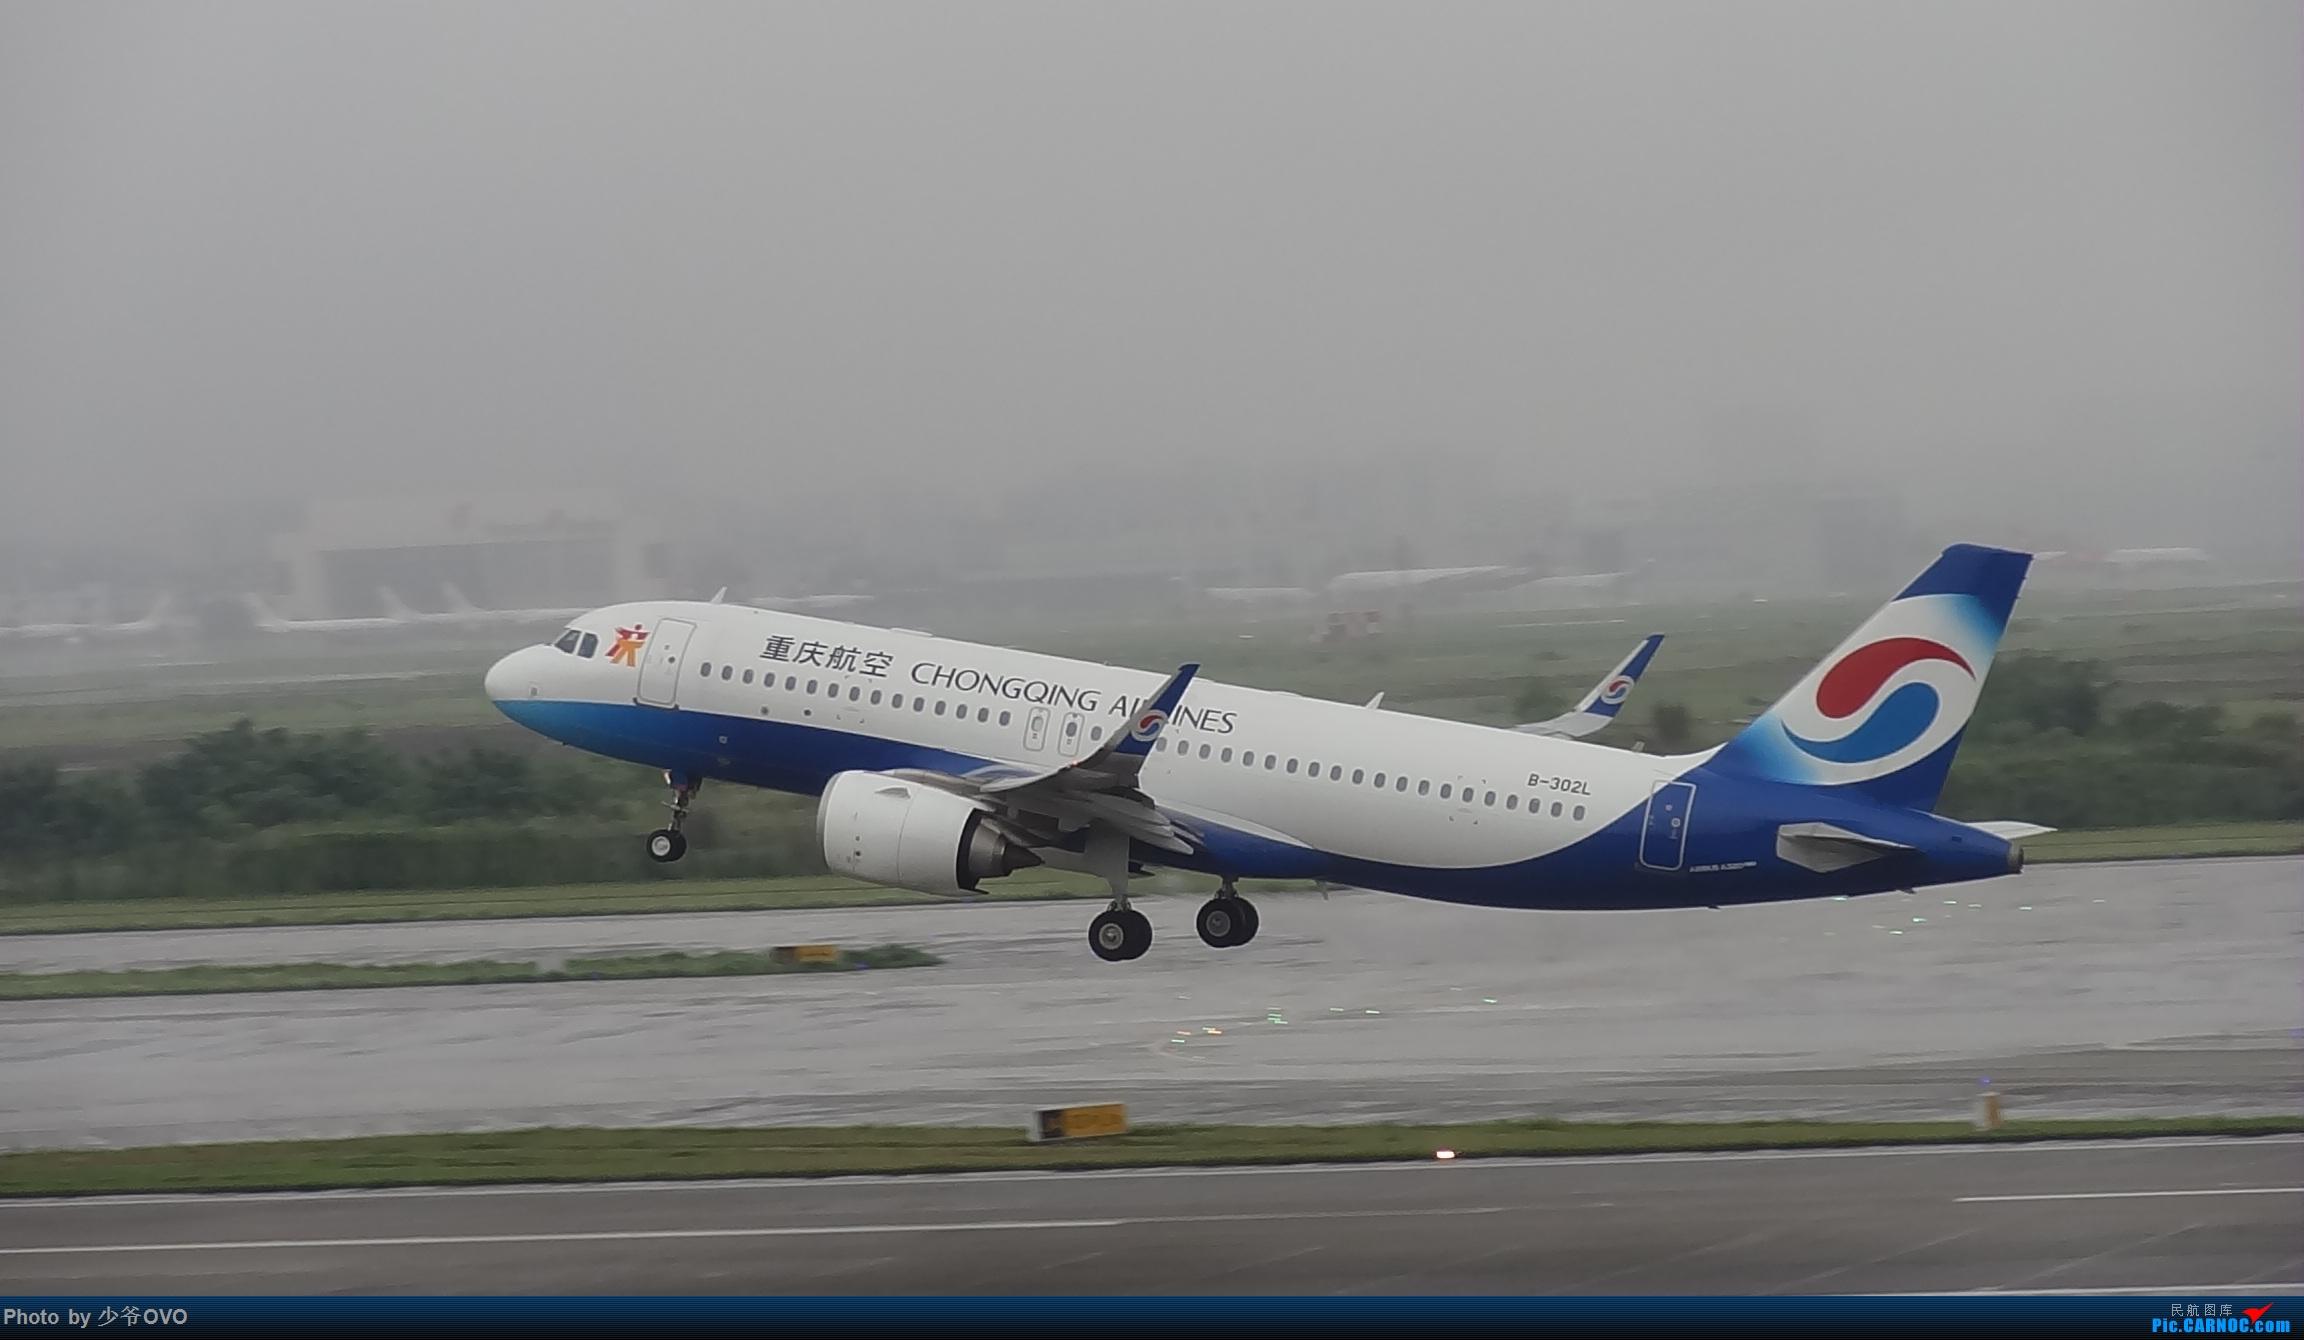 Re:[原创]CKG重庆江北机场拍机 ,中法建交50周年 AIRBUS A320NEO B-302L 中国重庆江北国际机场